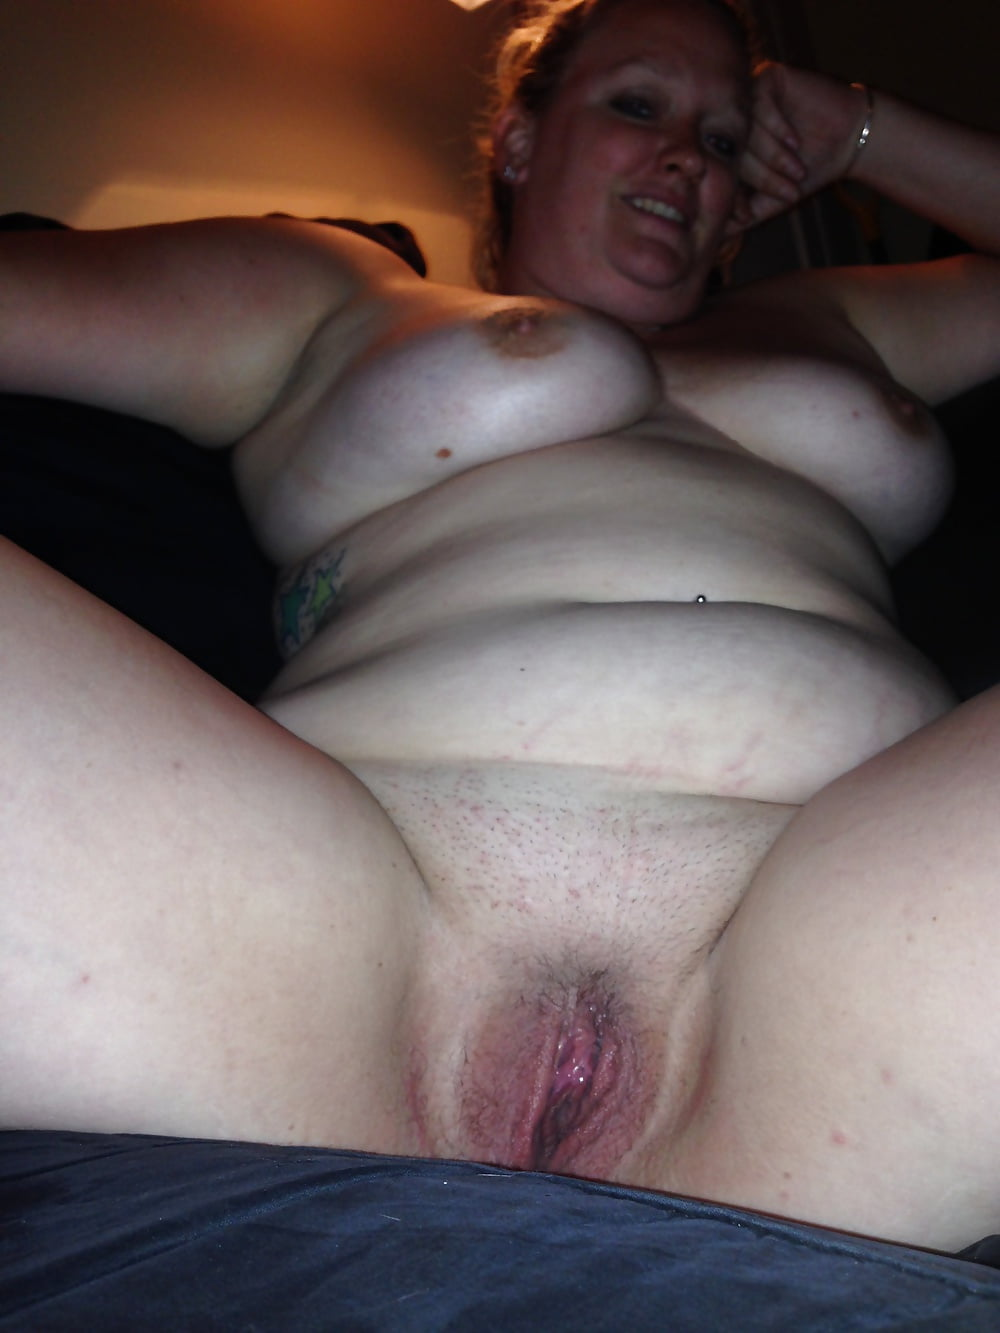 Amateur Chubby Wife Dirty Worn Panties - 28 Pics  Xhamster-3237